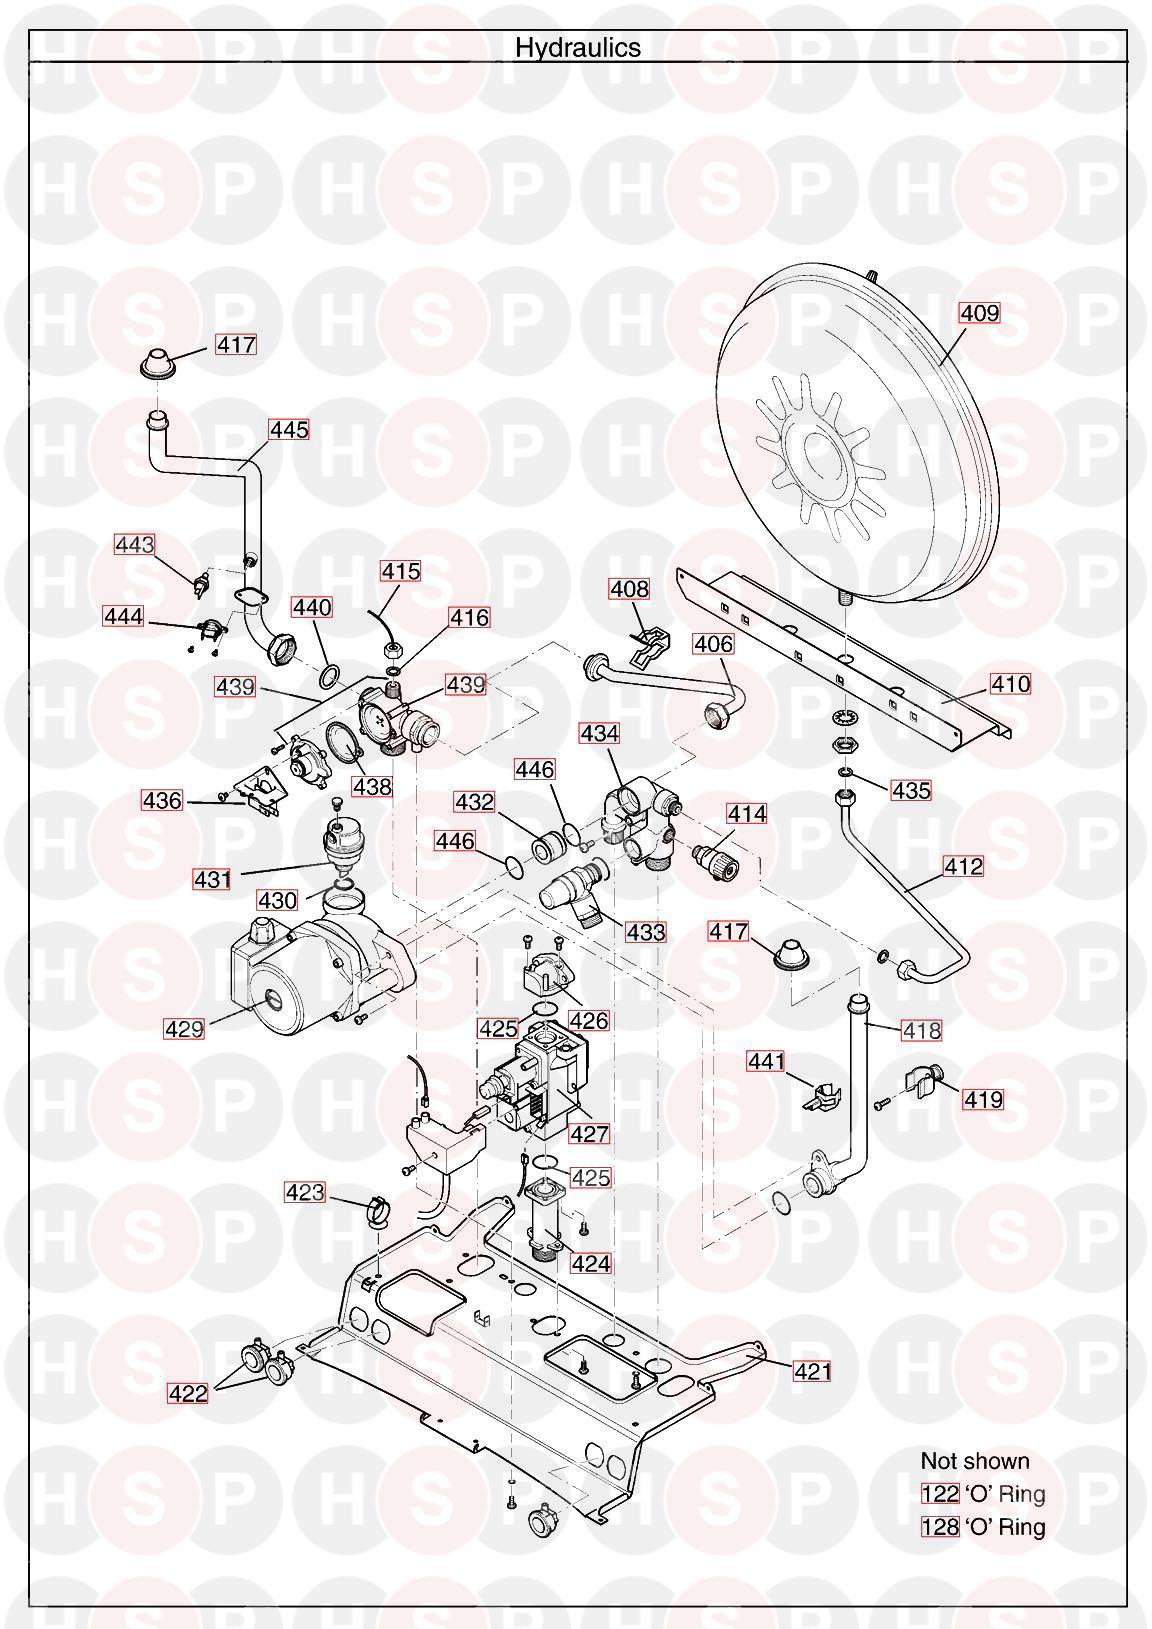 Honeywell Millivolt Wiring Diagrams Com